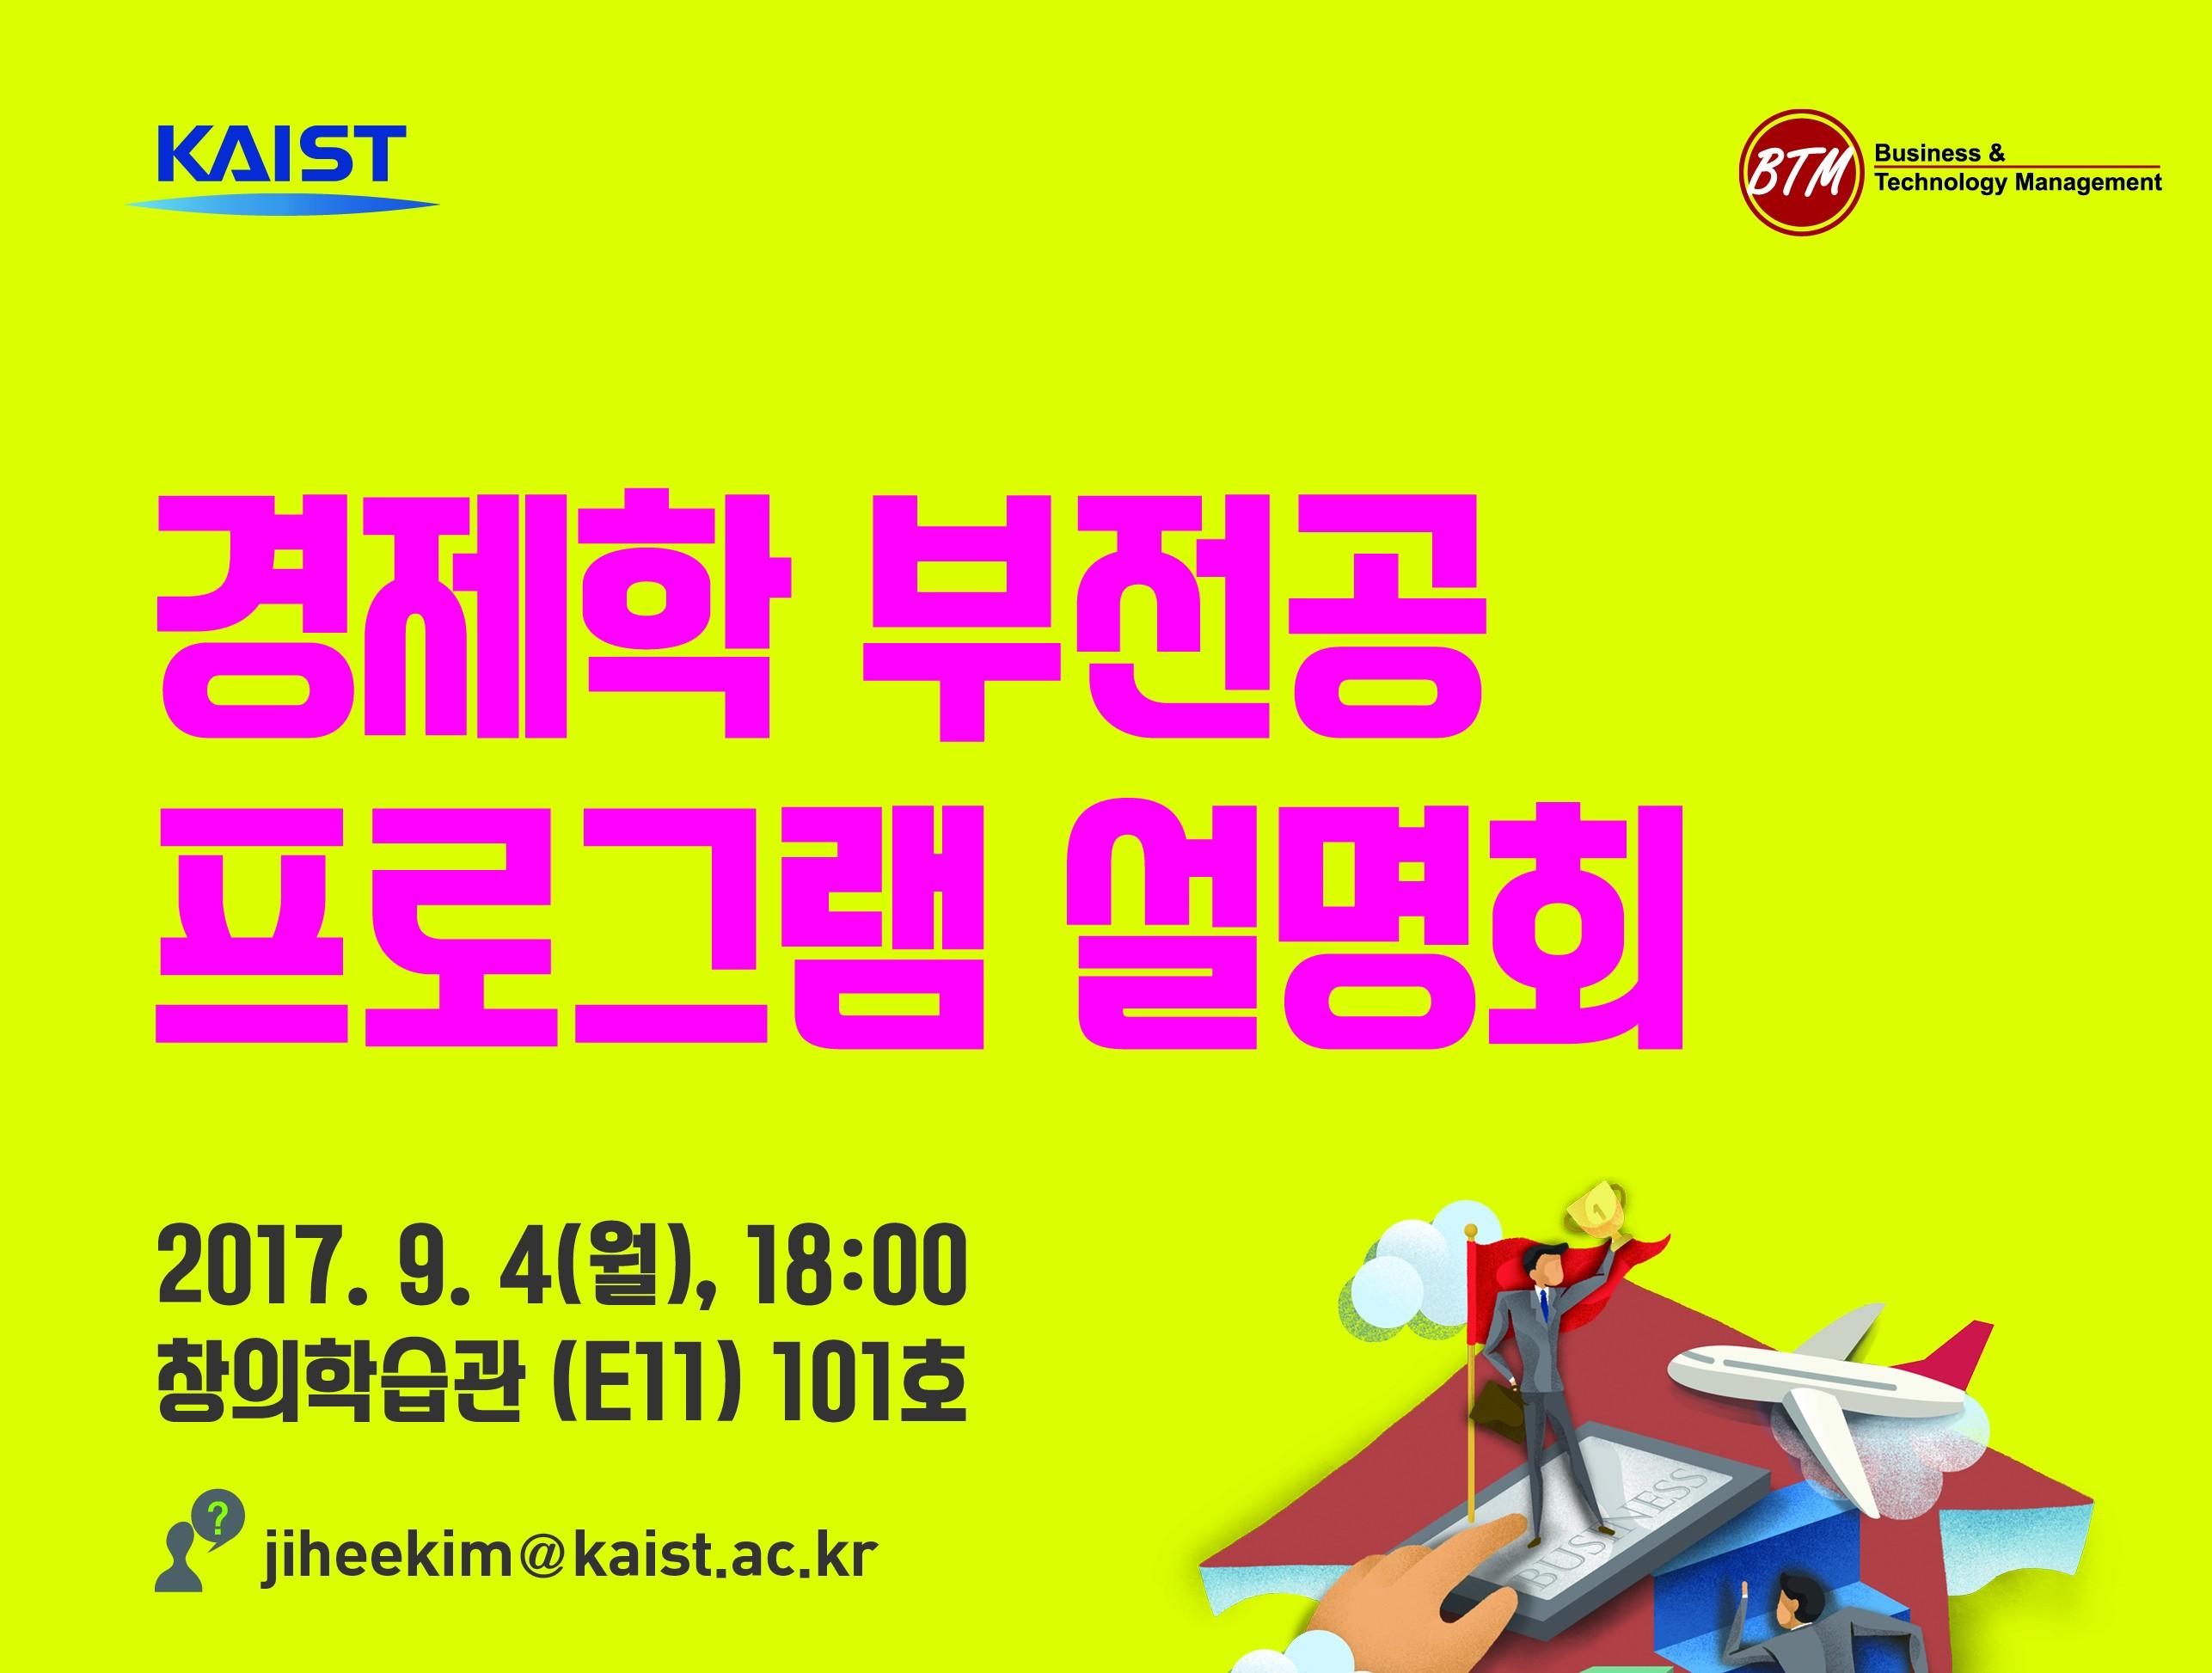 [News] Economics Minor Program Briefing Session for KAIST Undergraduate Course Students (9/4, 18:00)